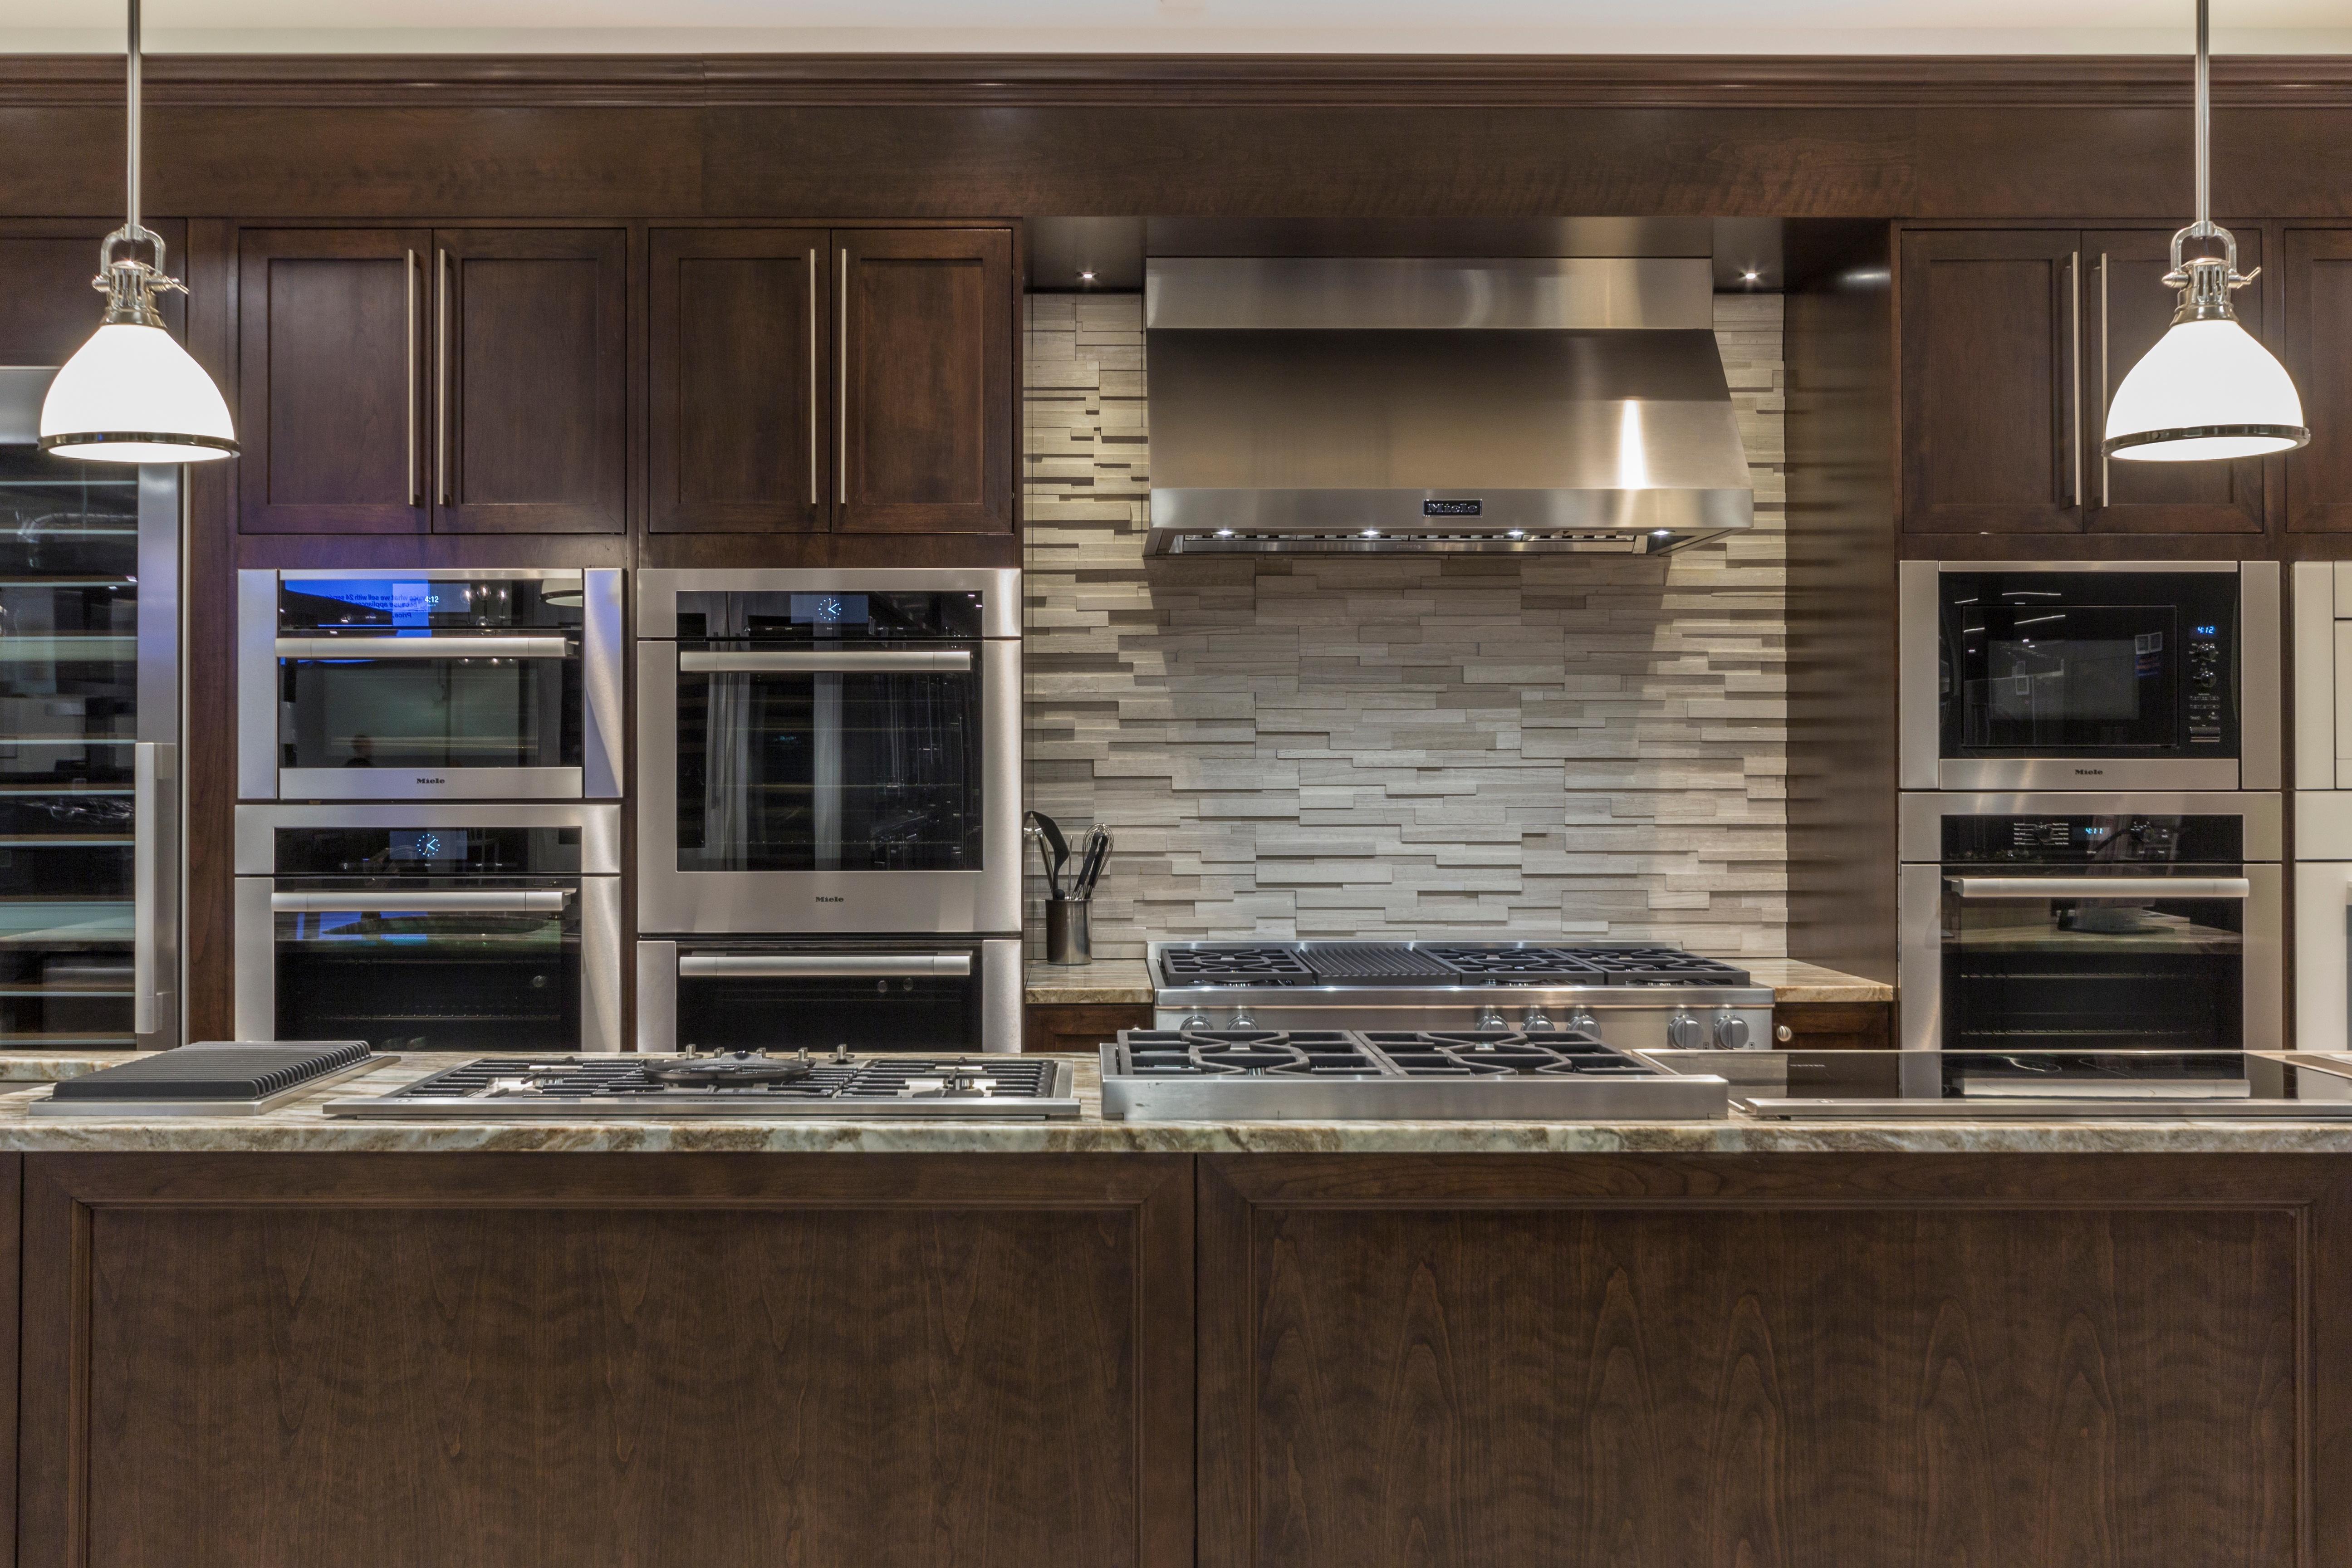 Kitchen Remodeling Northern Virginia: Top Kitchen Appliances ...